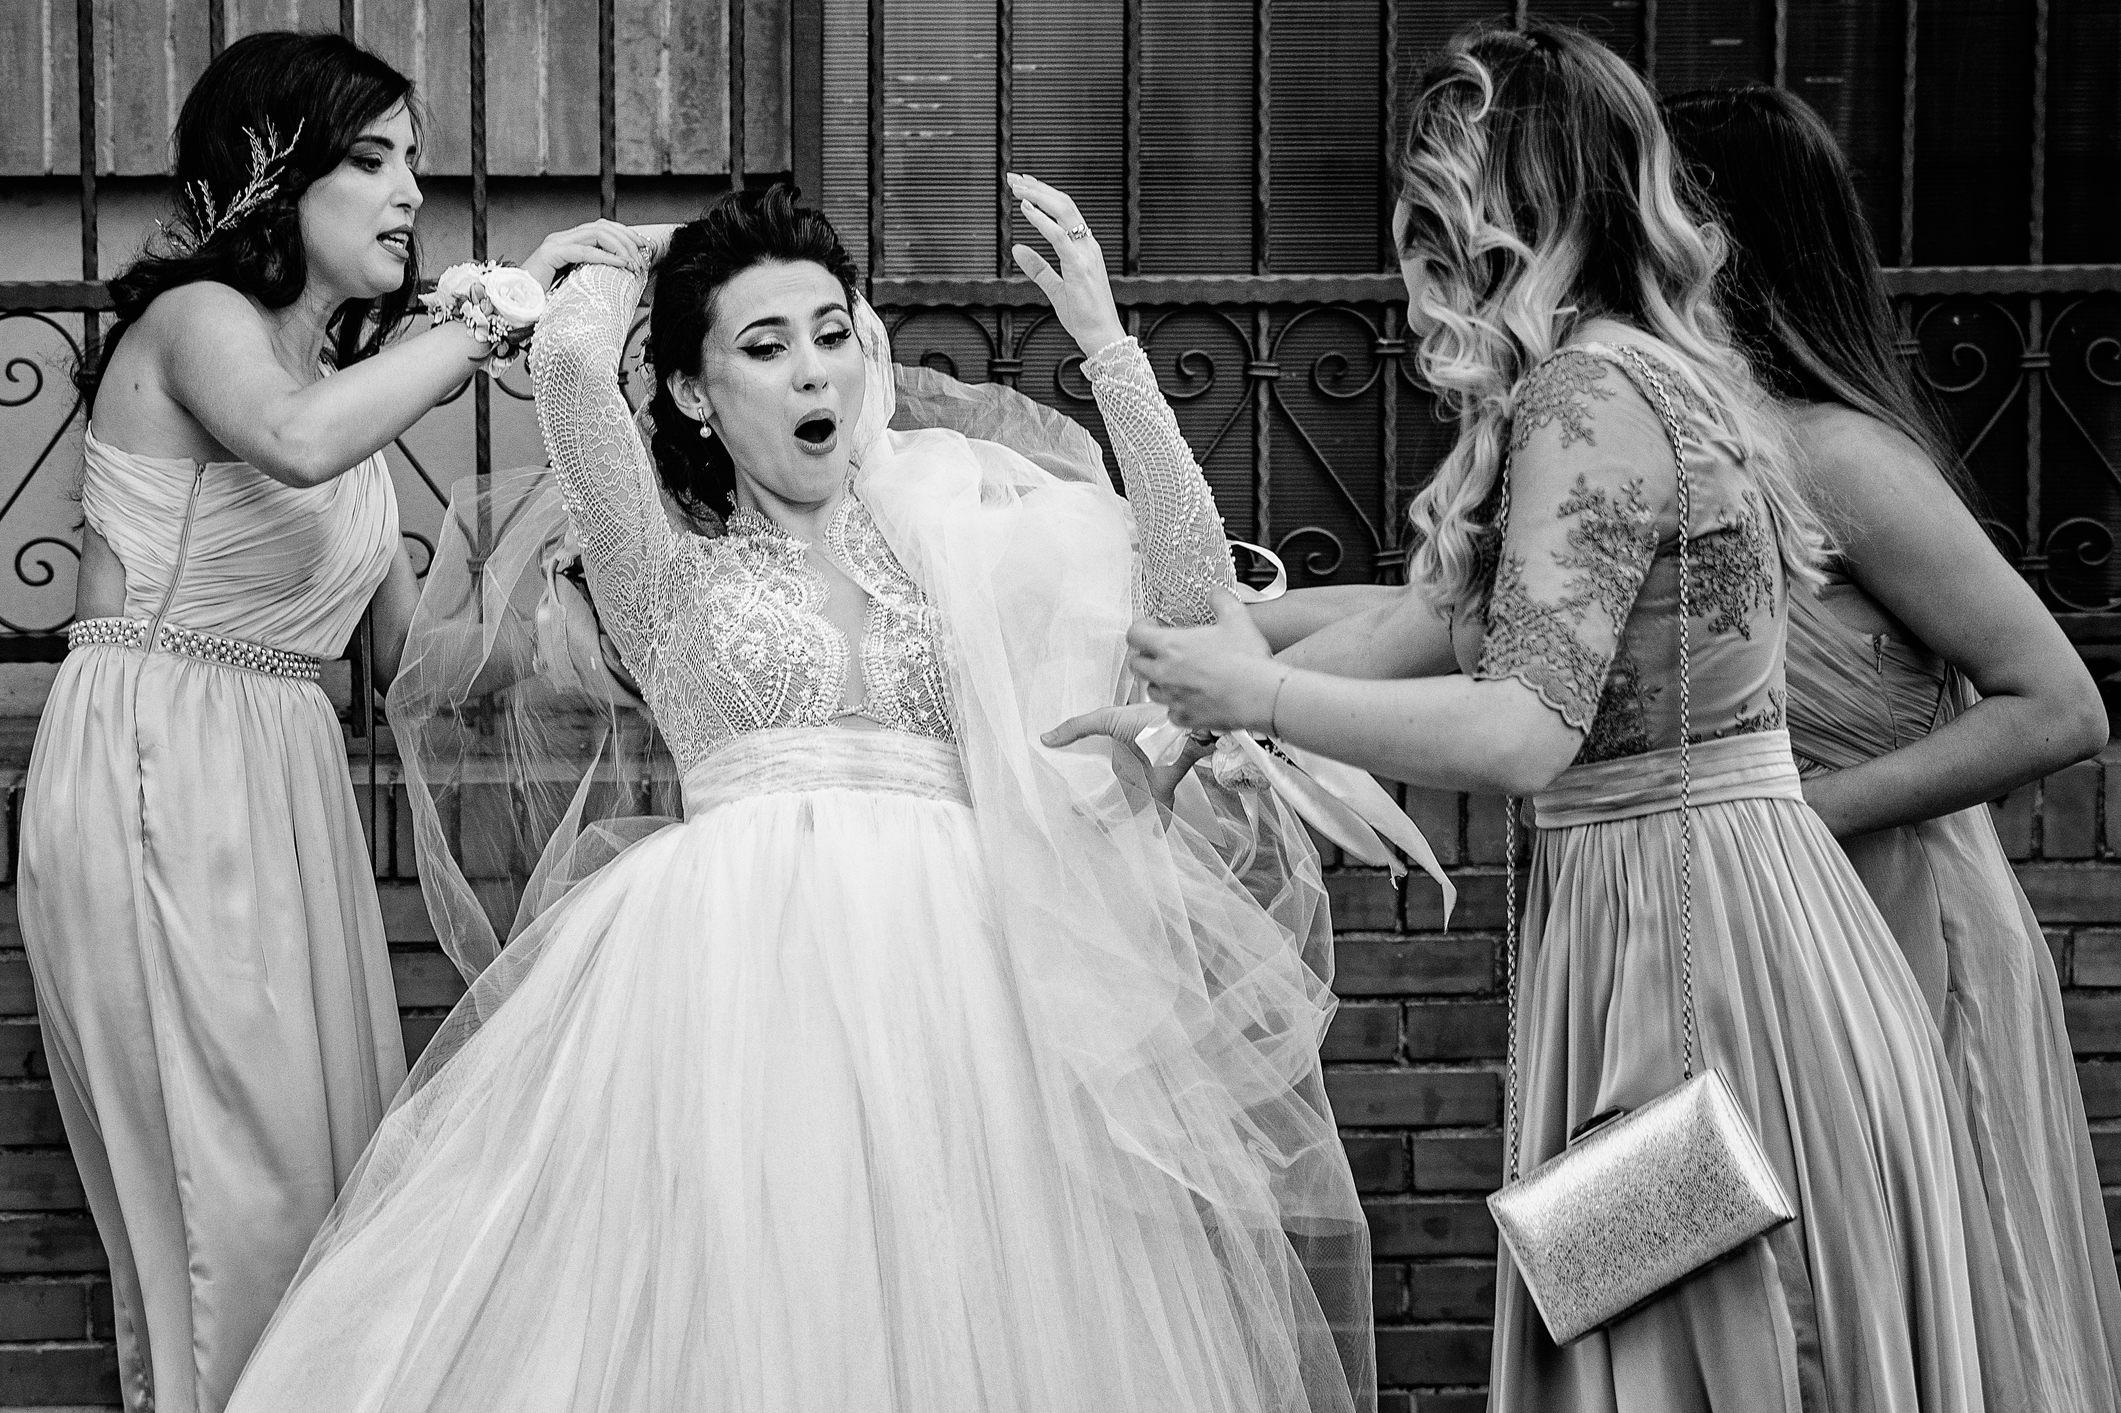 fotograf nunta bucuresti laurentiu nica  13 - Lorena & Matei | Fotografii nunta Bucuresti | Restaurant Domeniul cu Ciresi